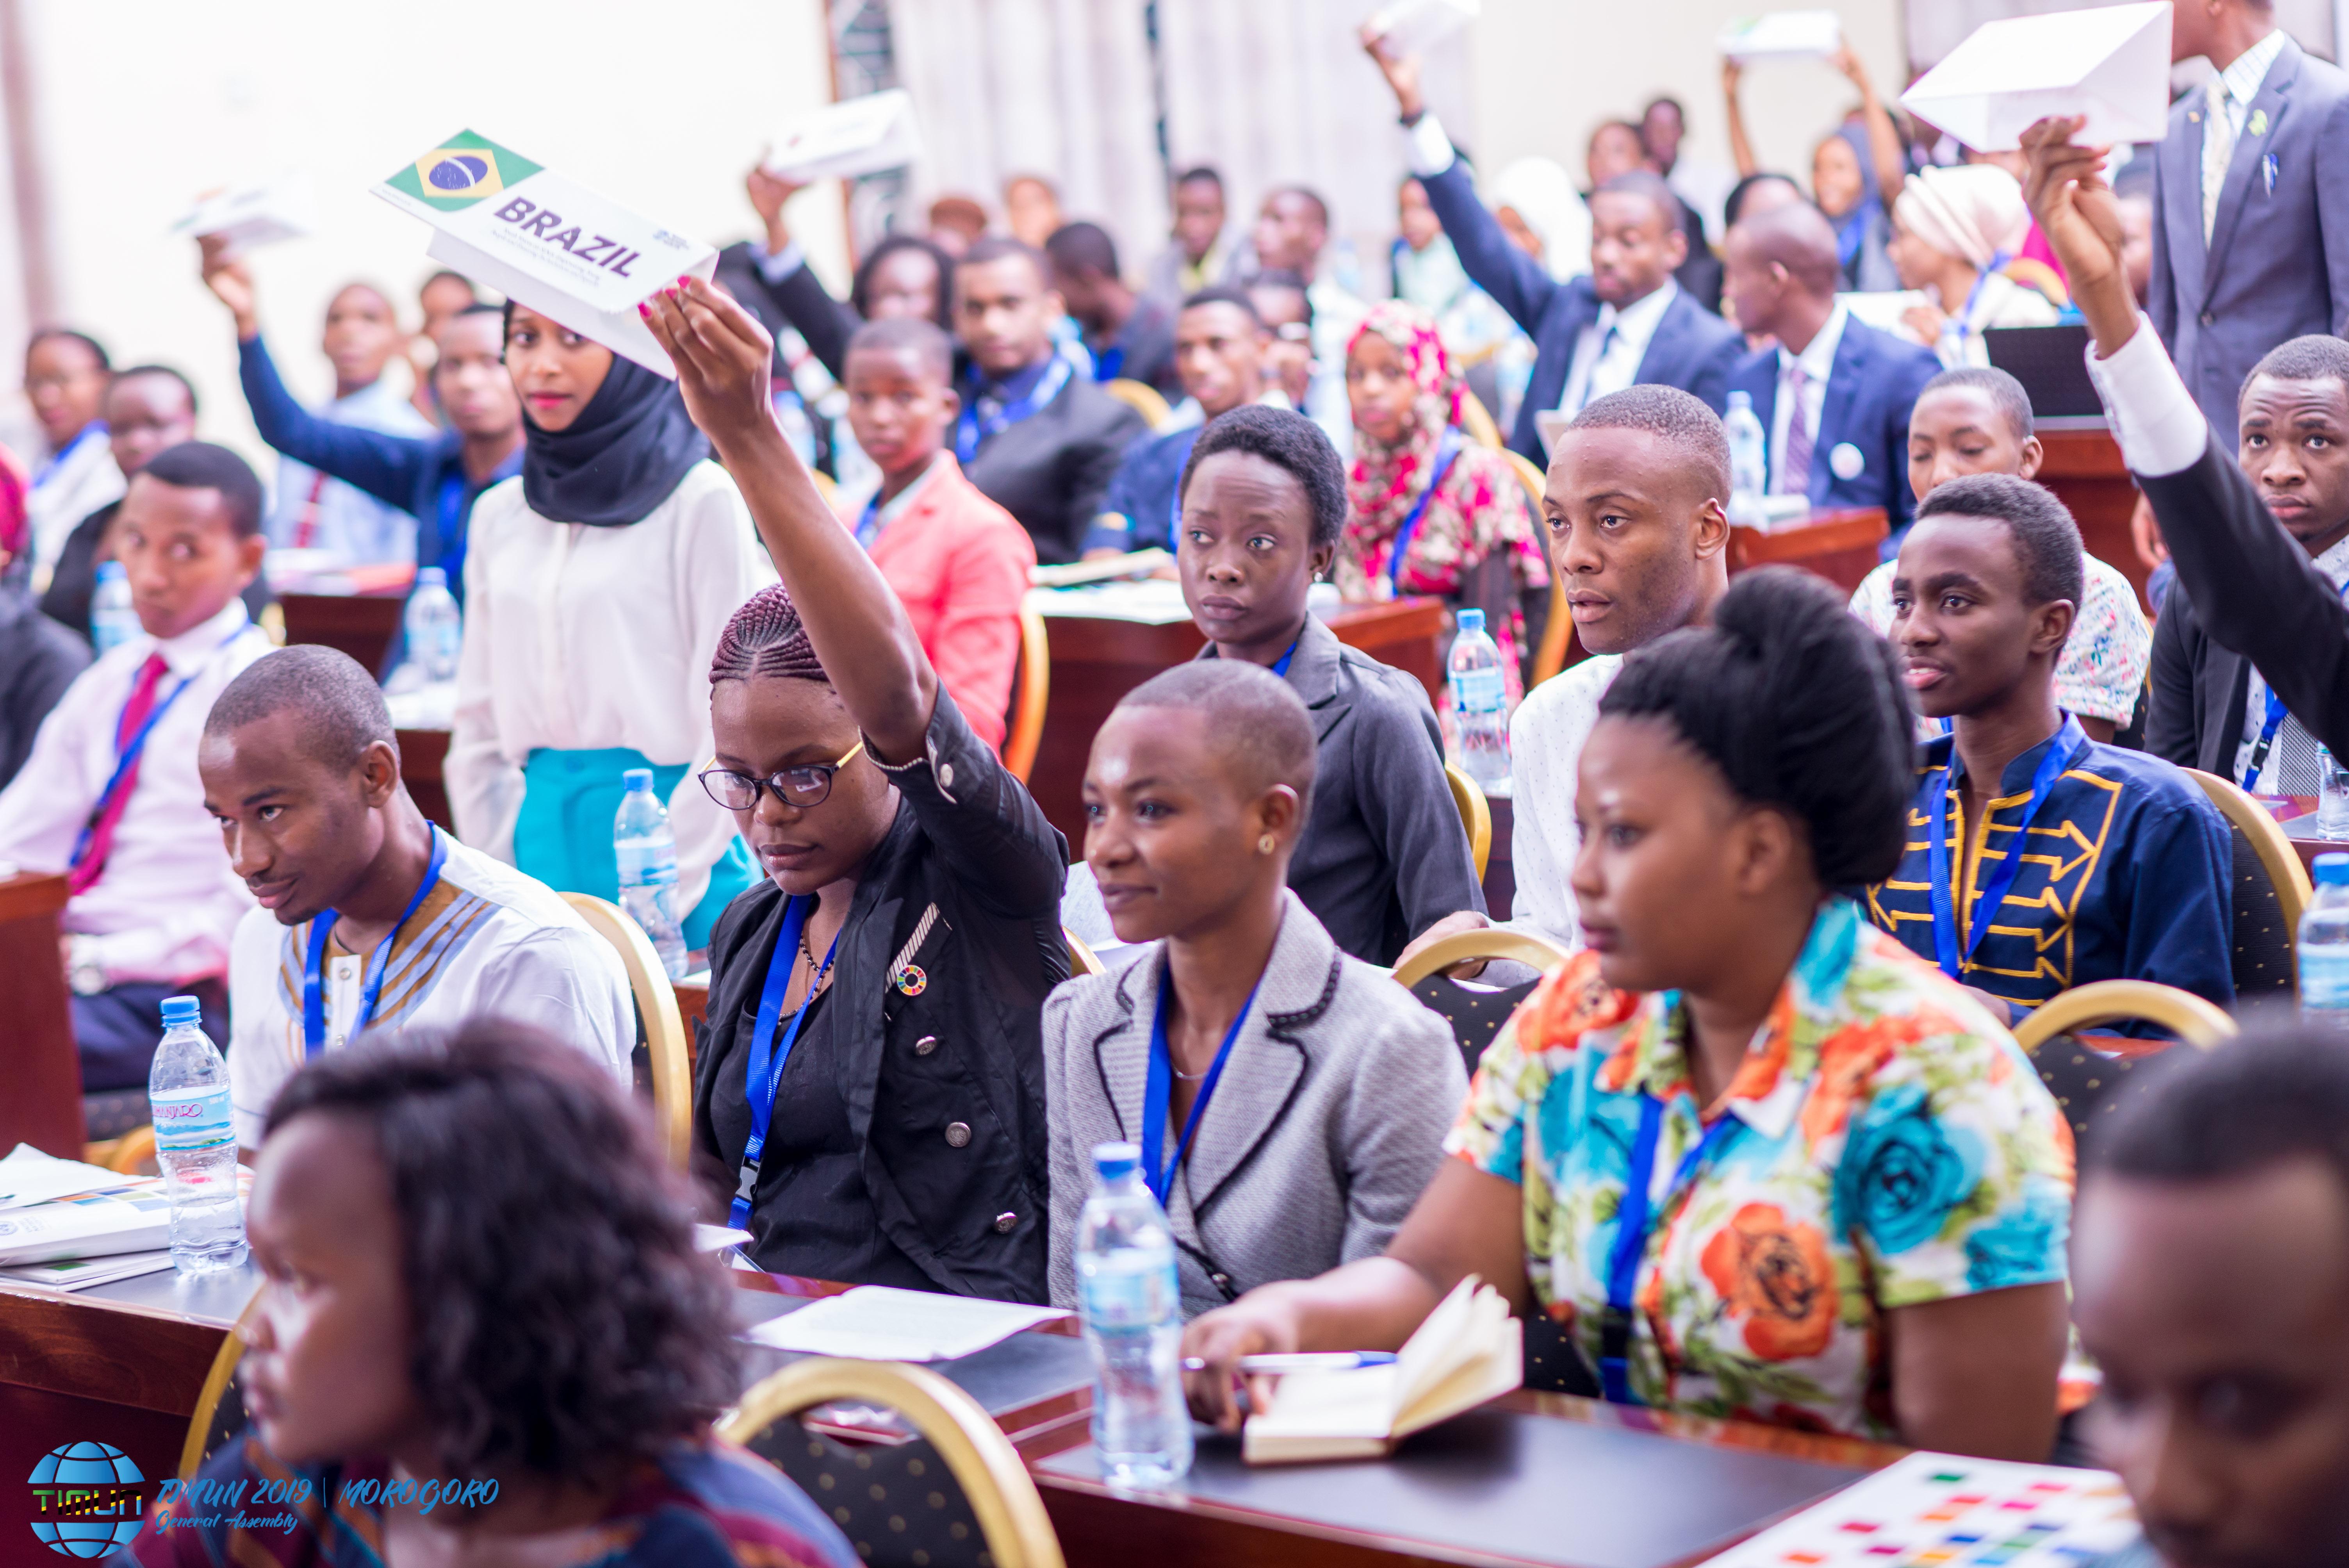 2019 Tanzania International Model United Nations (TIMUN)